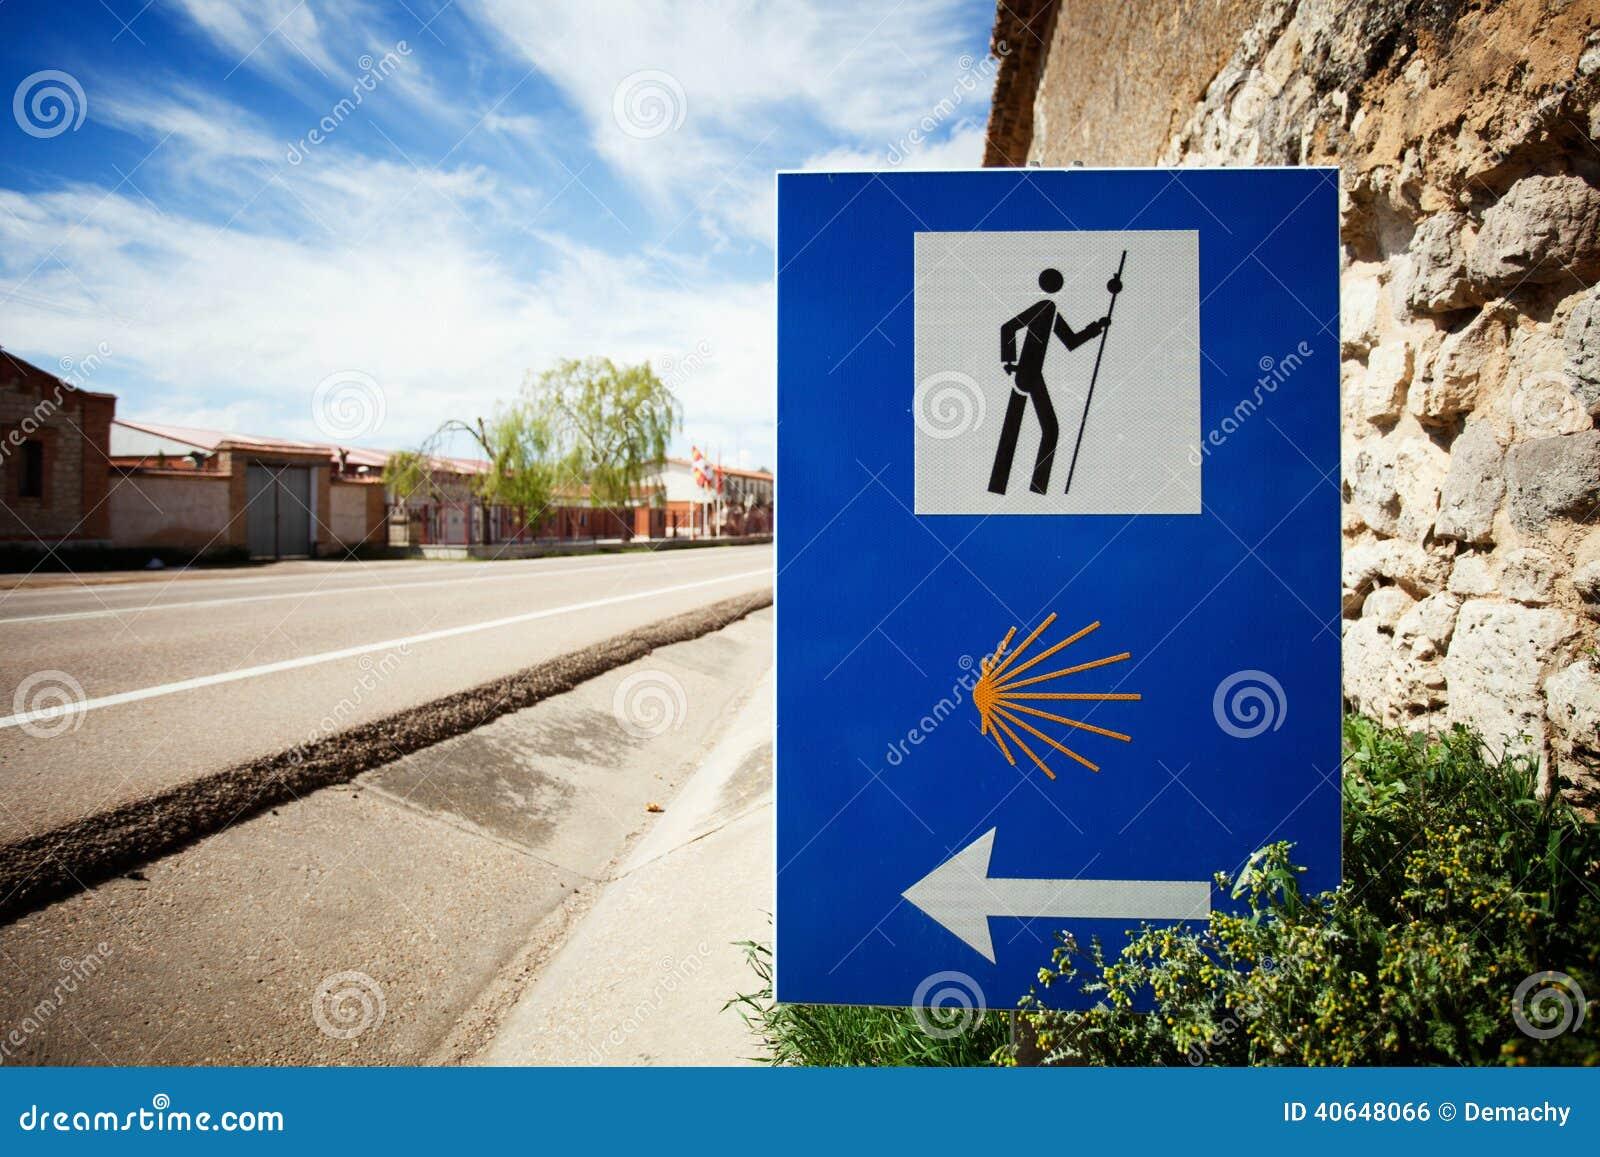 Camino de圣地亚哥的符号